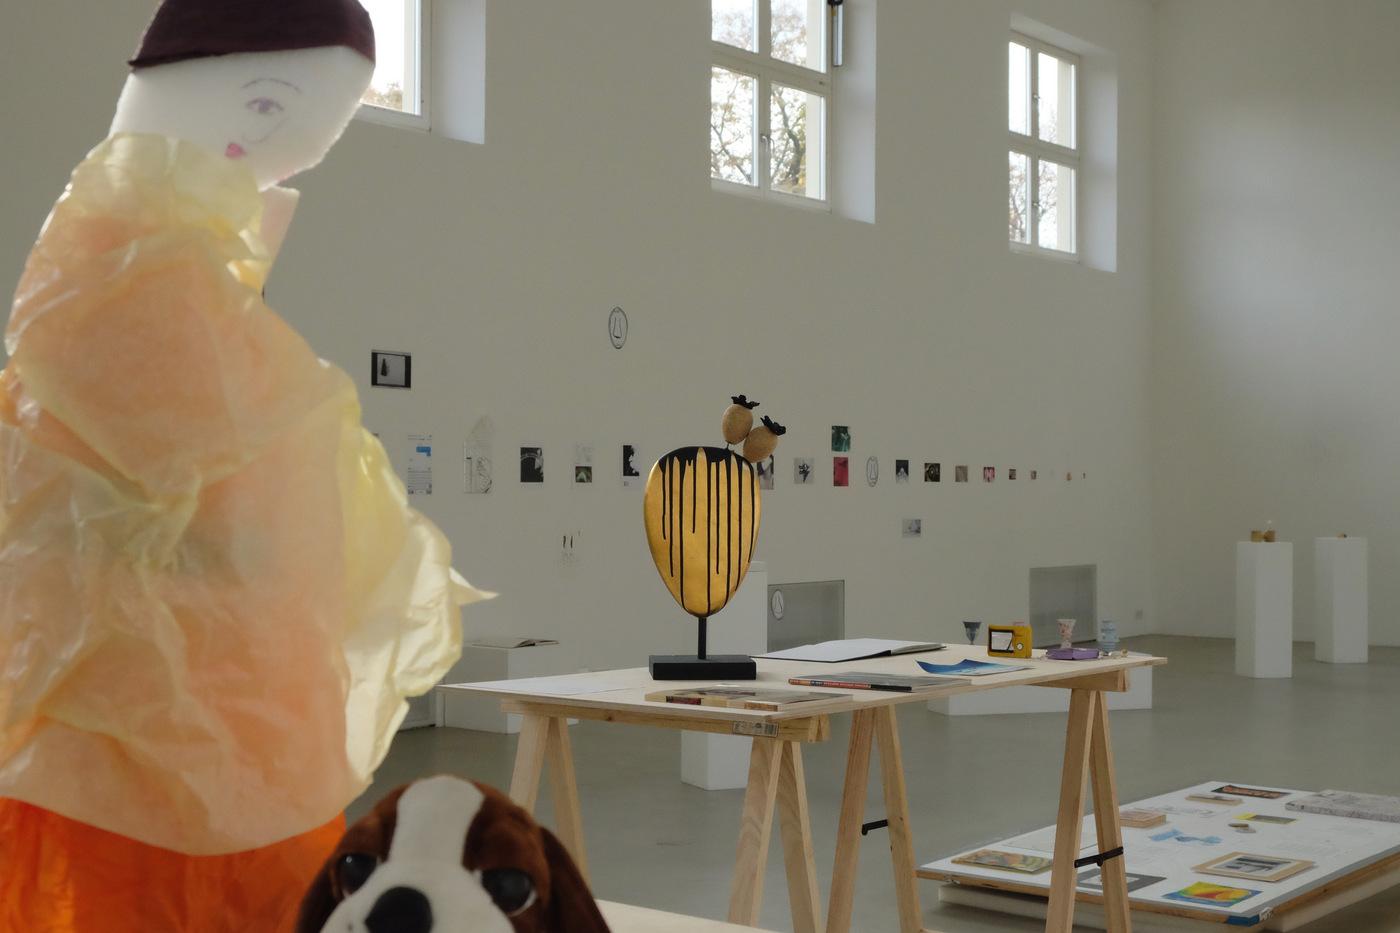 Nopal leaf No. 3 at Darius Mikšys, Hayward & Tamayo Exhibition at Kunstverein, München, 2016.